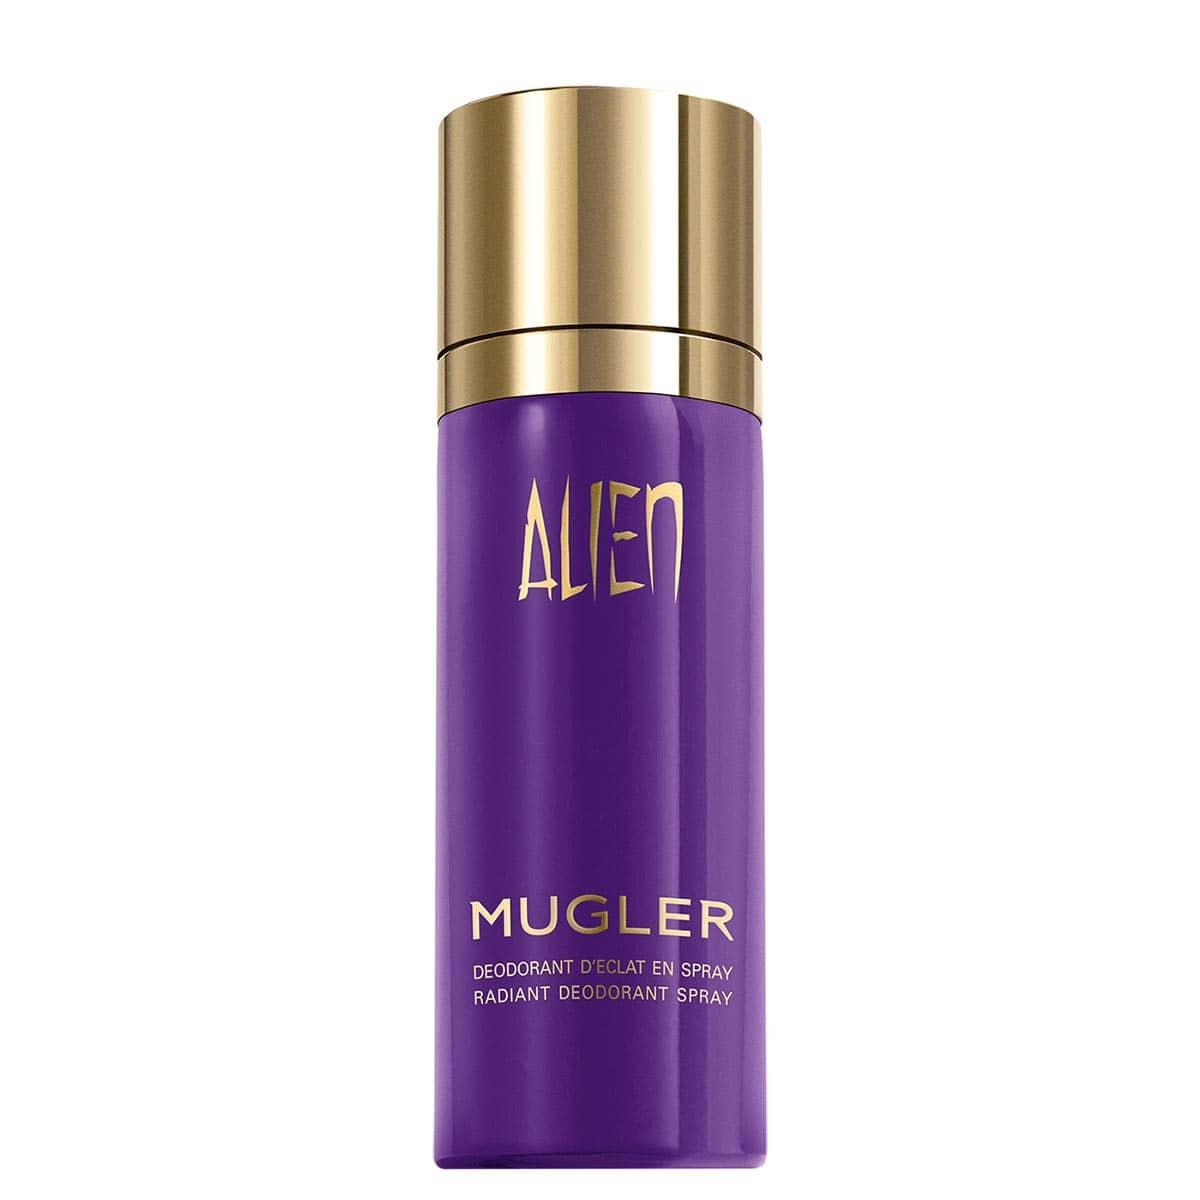 MUGLER - Alien - Déodorant d'Eclat Spray 100 ml